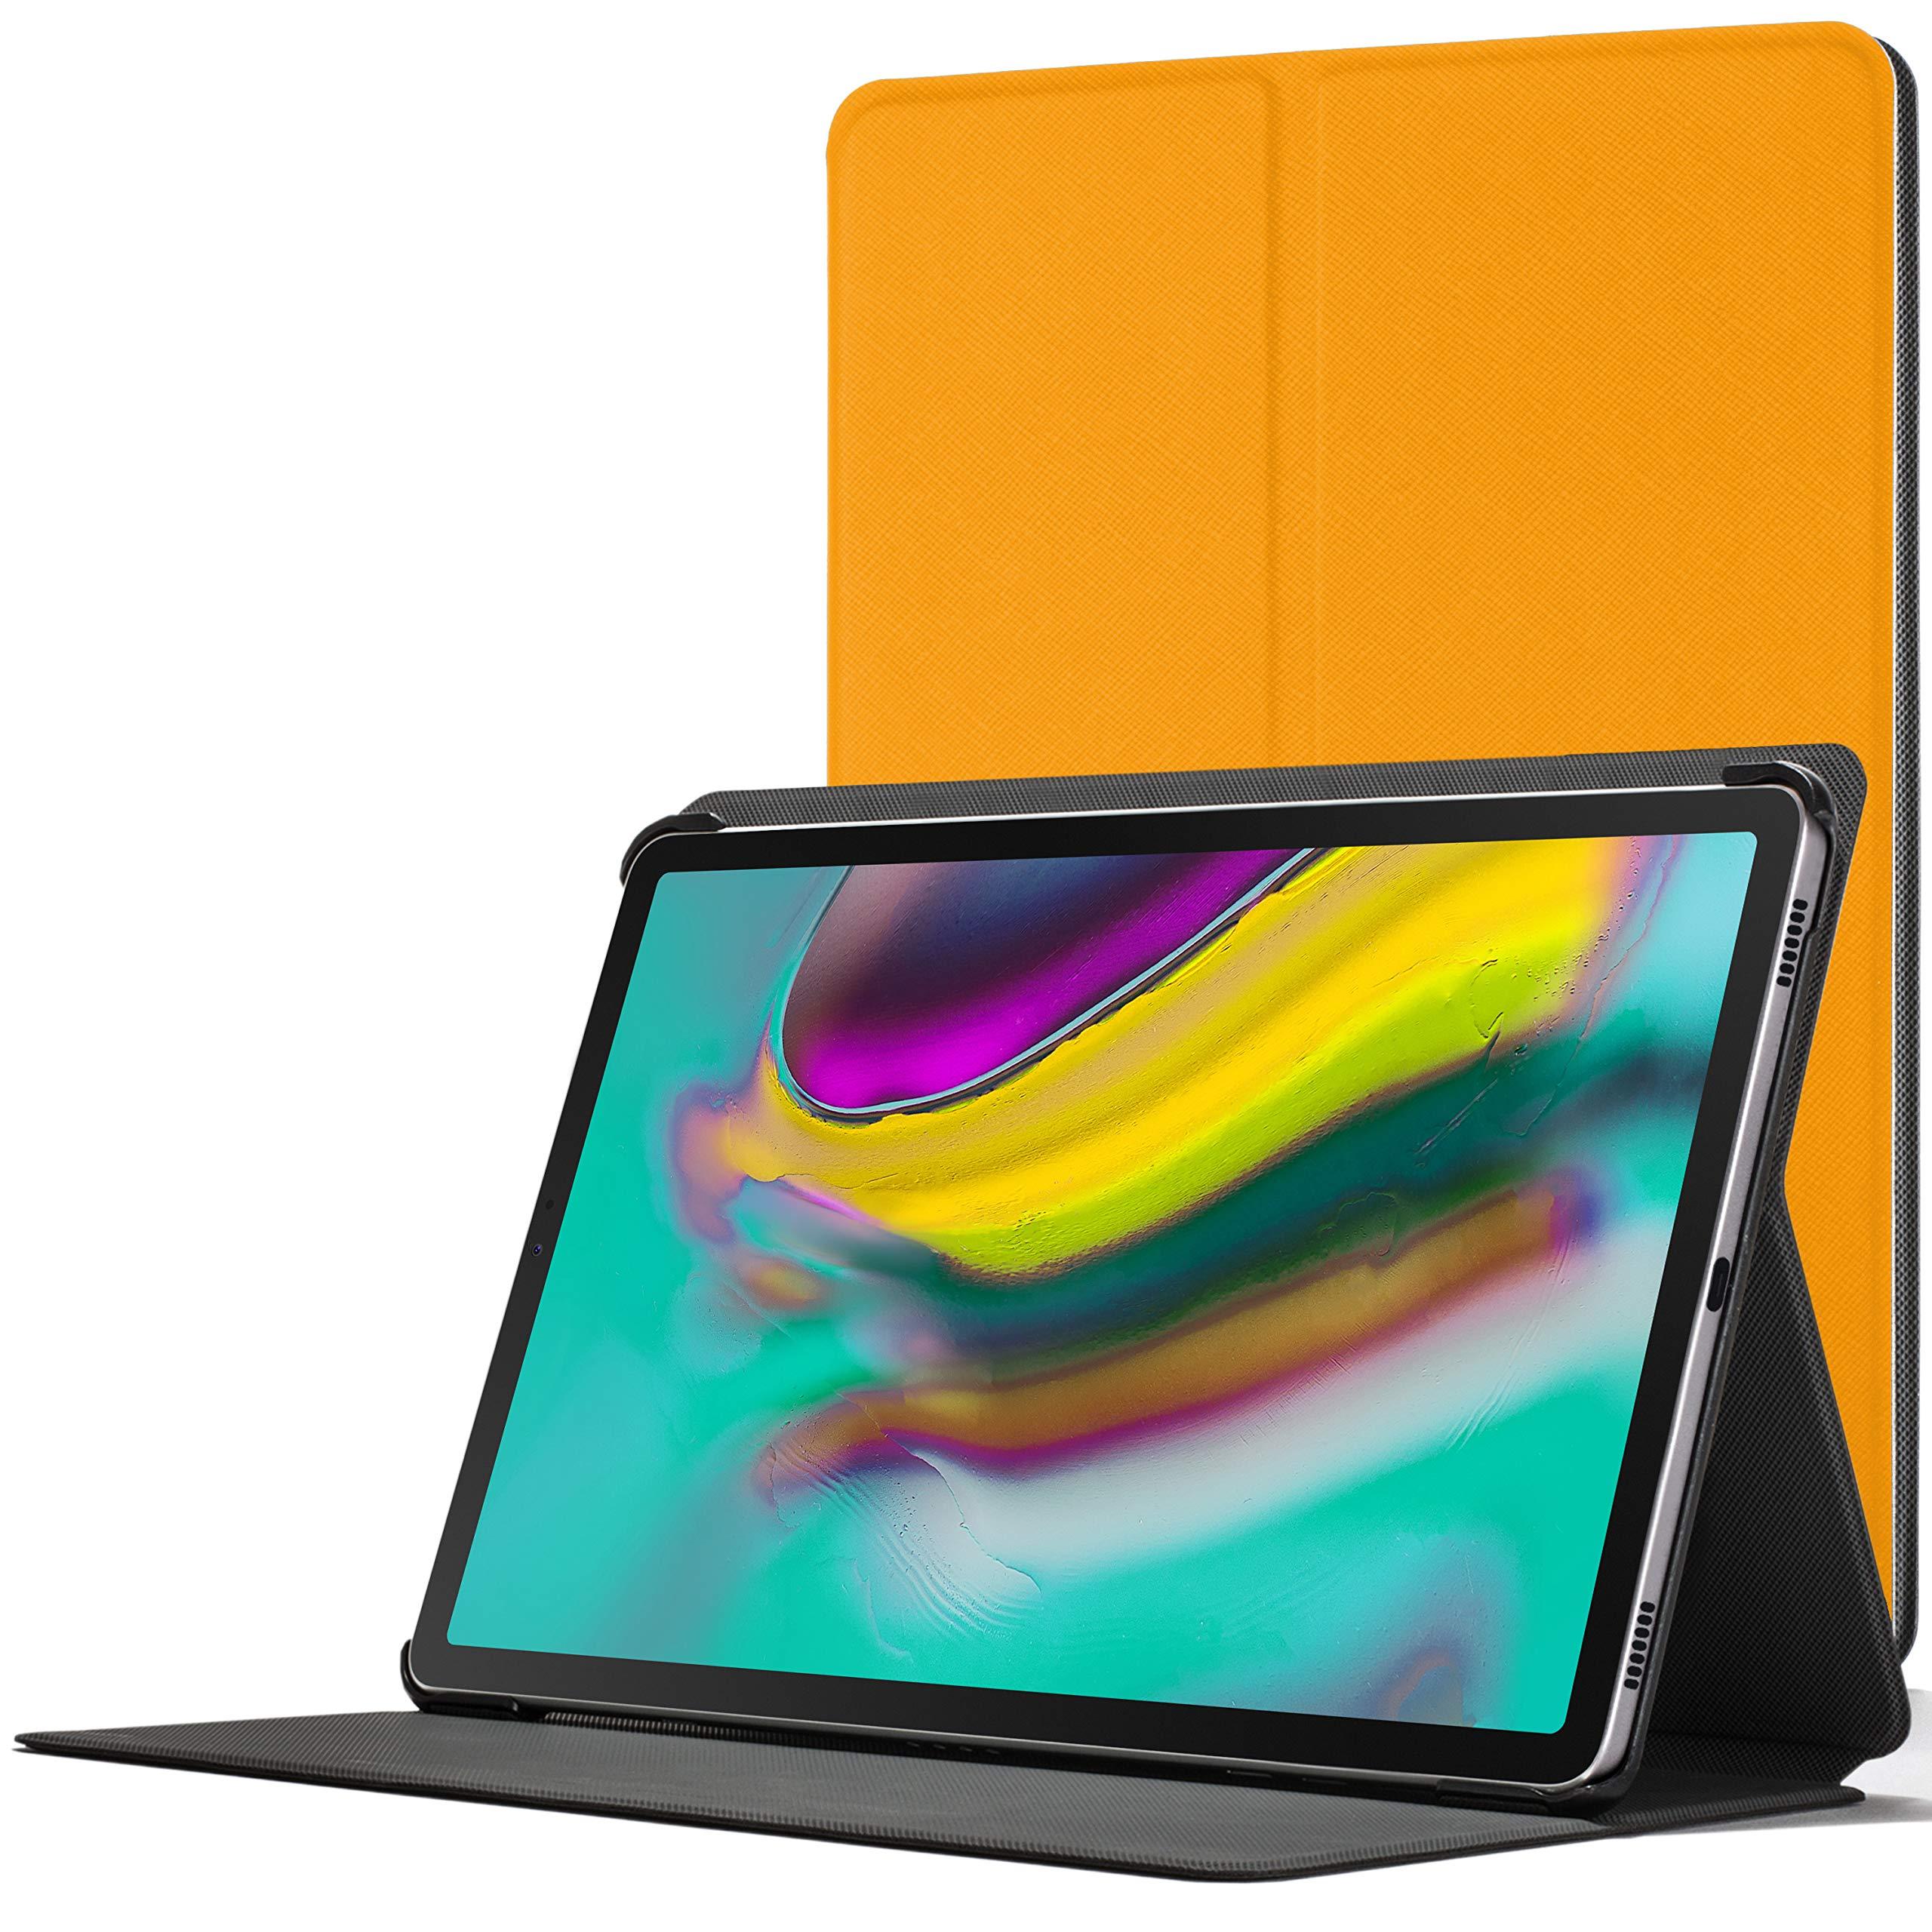 Funda Samsung Galaxy Tab S5e Forefront Cases [7r5tqdcs]